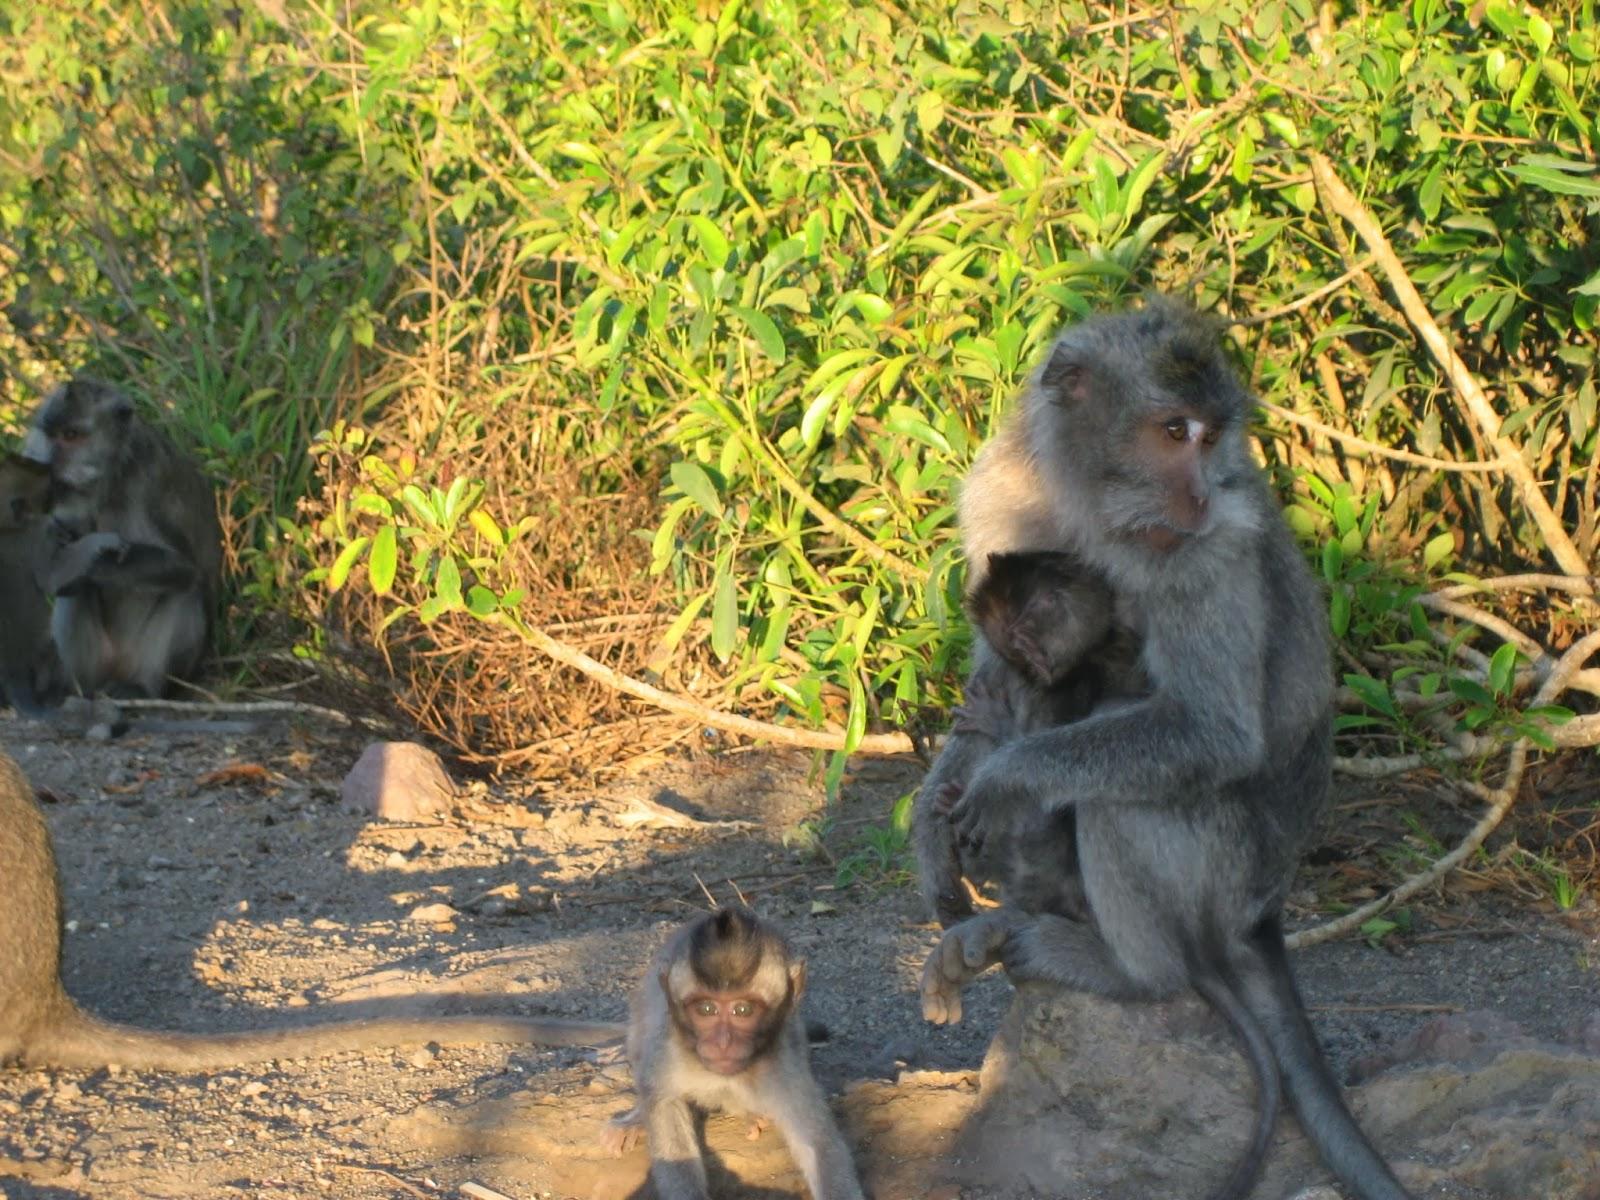 mt-batur-monkeys-sunrise-trek-bali-volcano